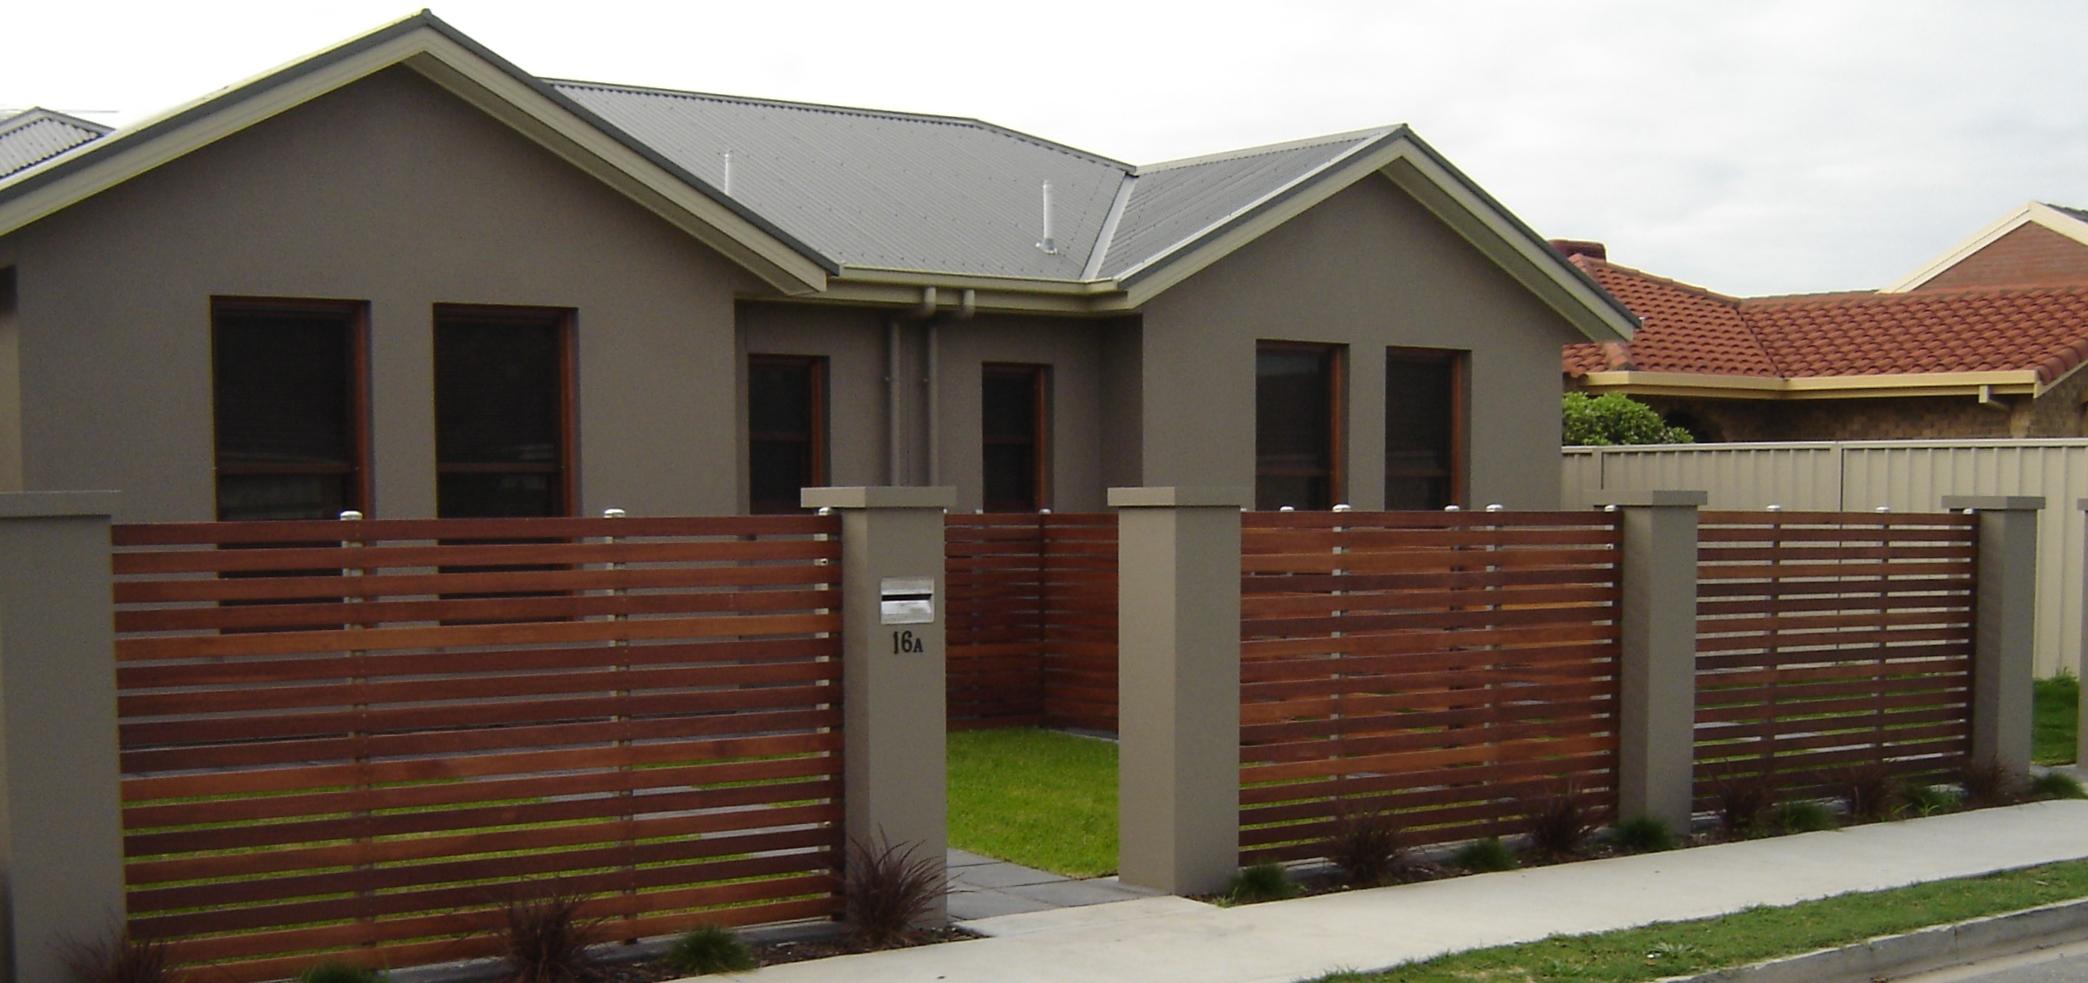 Modern-Exterior-Gate-Design-Of-Modern-Gate-Design-Simple-Wooden-Gate-Small-Garden-Dark-Grey-Wall-Colour.jpg